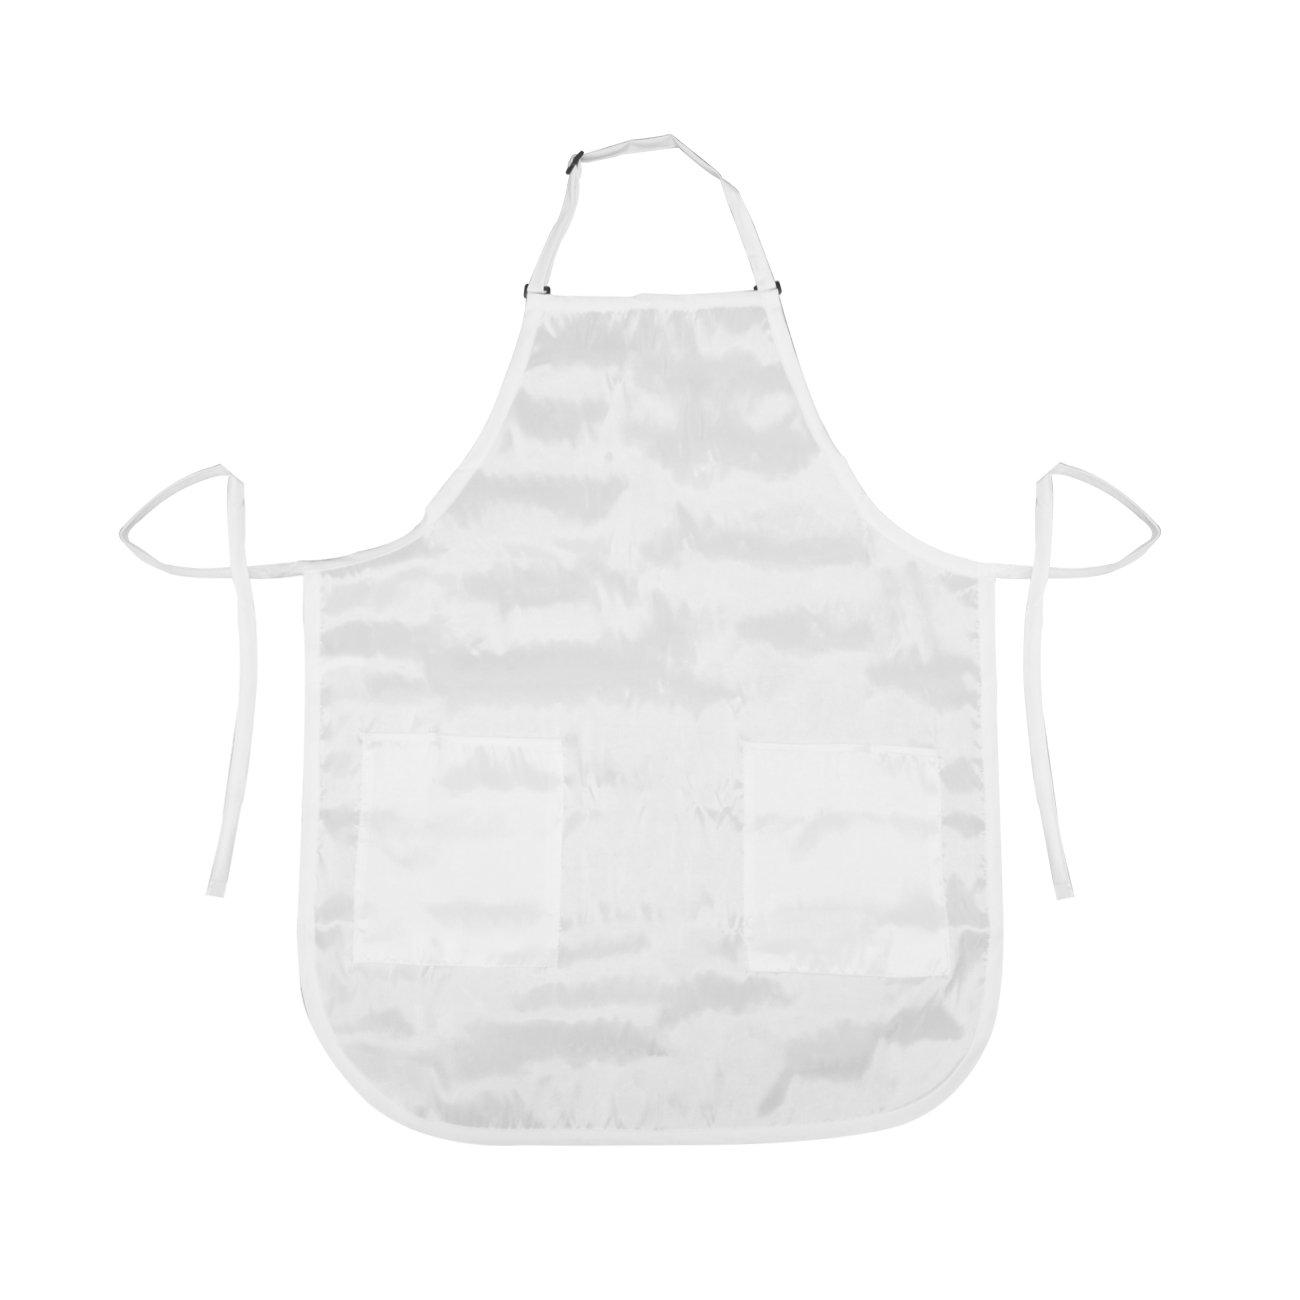 Betty Dain Luminous Salon Stylist Apron with Hidden Zippered Pockets and Adjustable Neck, White